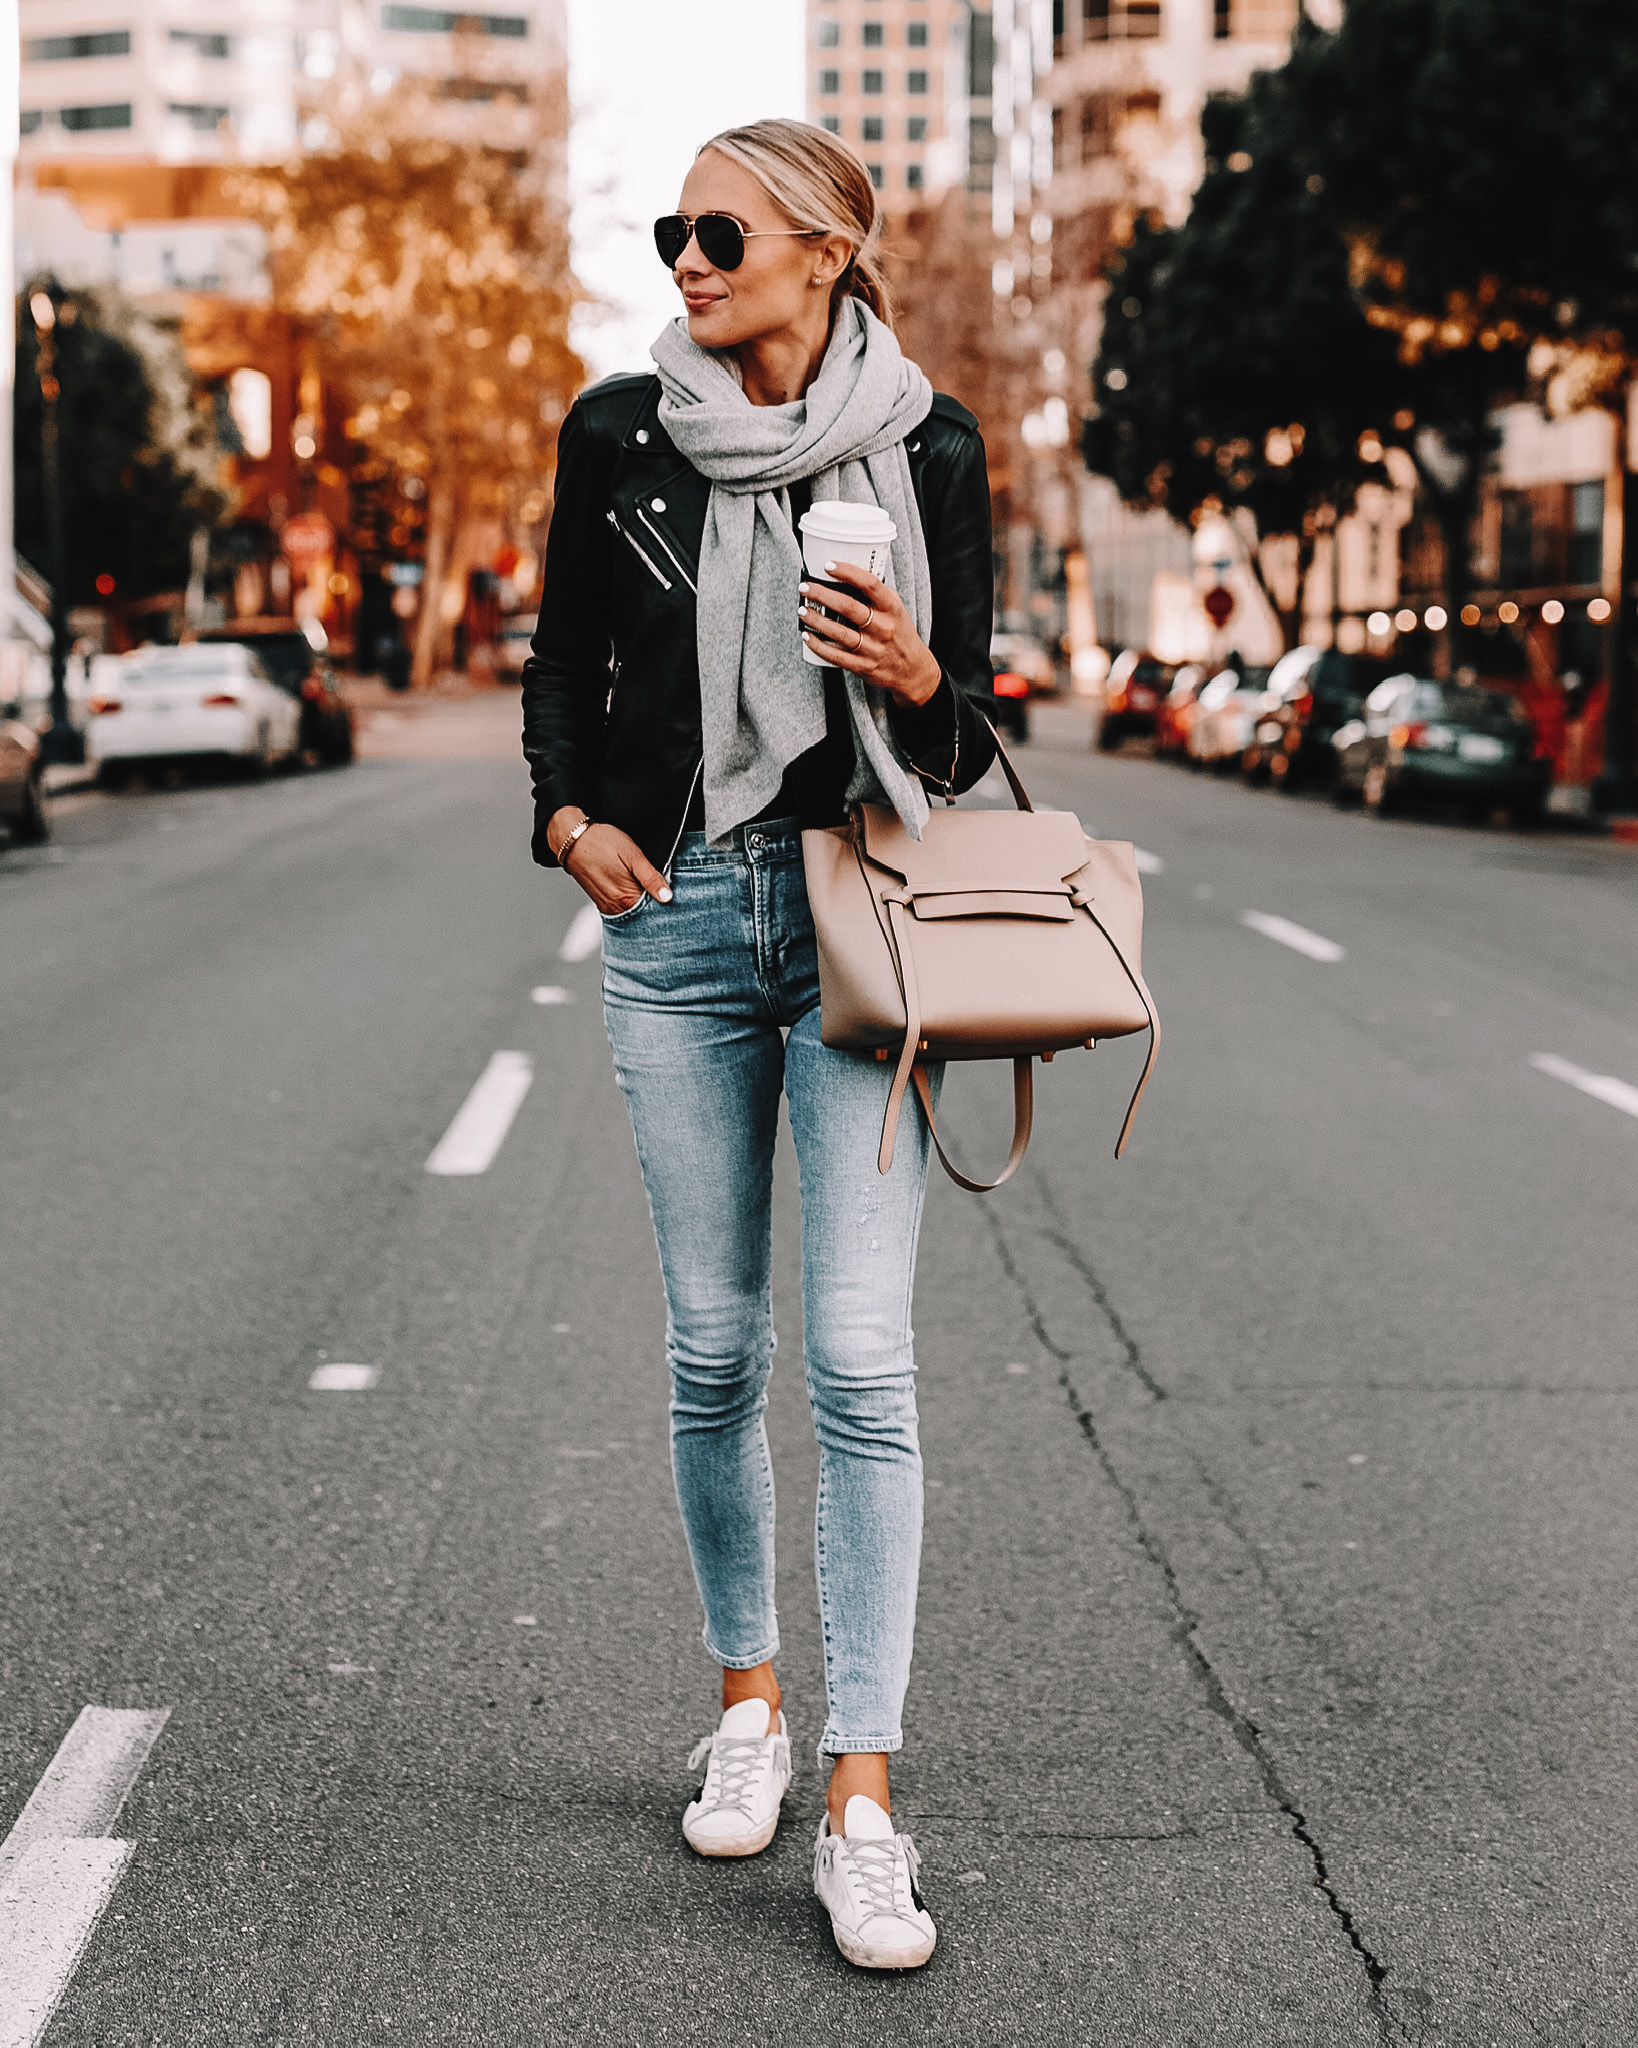 Fashion Jackson Wearing Black Leather Jacket Denim Skinny Jeans Grey Scarf Golden Goose Sneakers